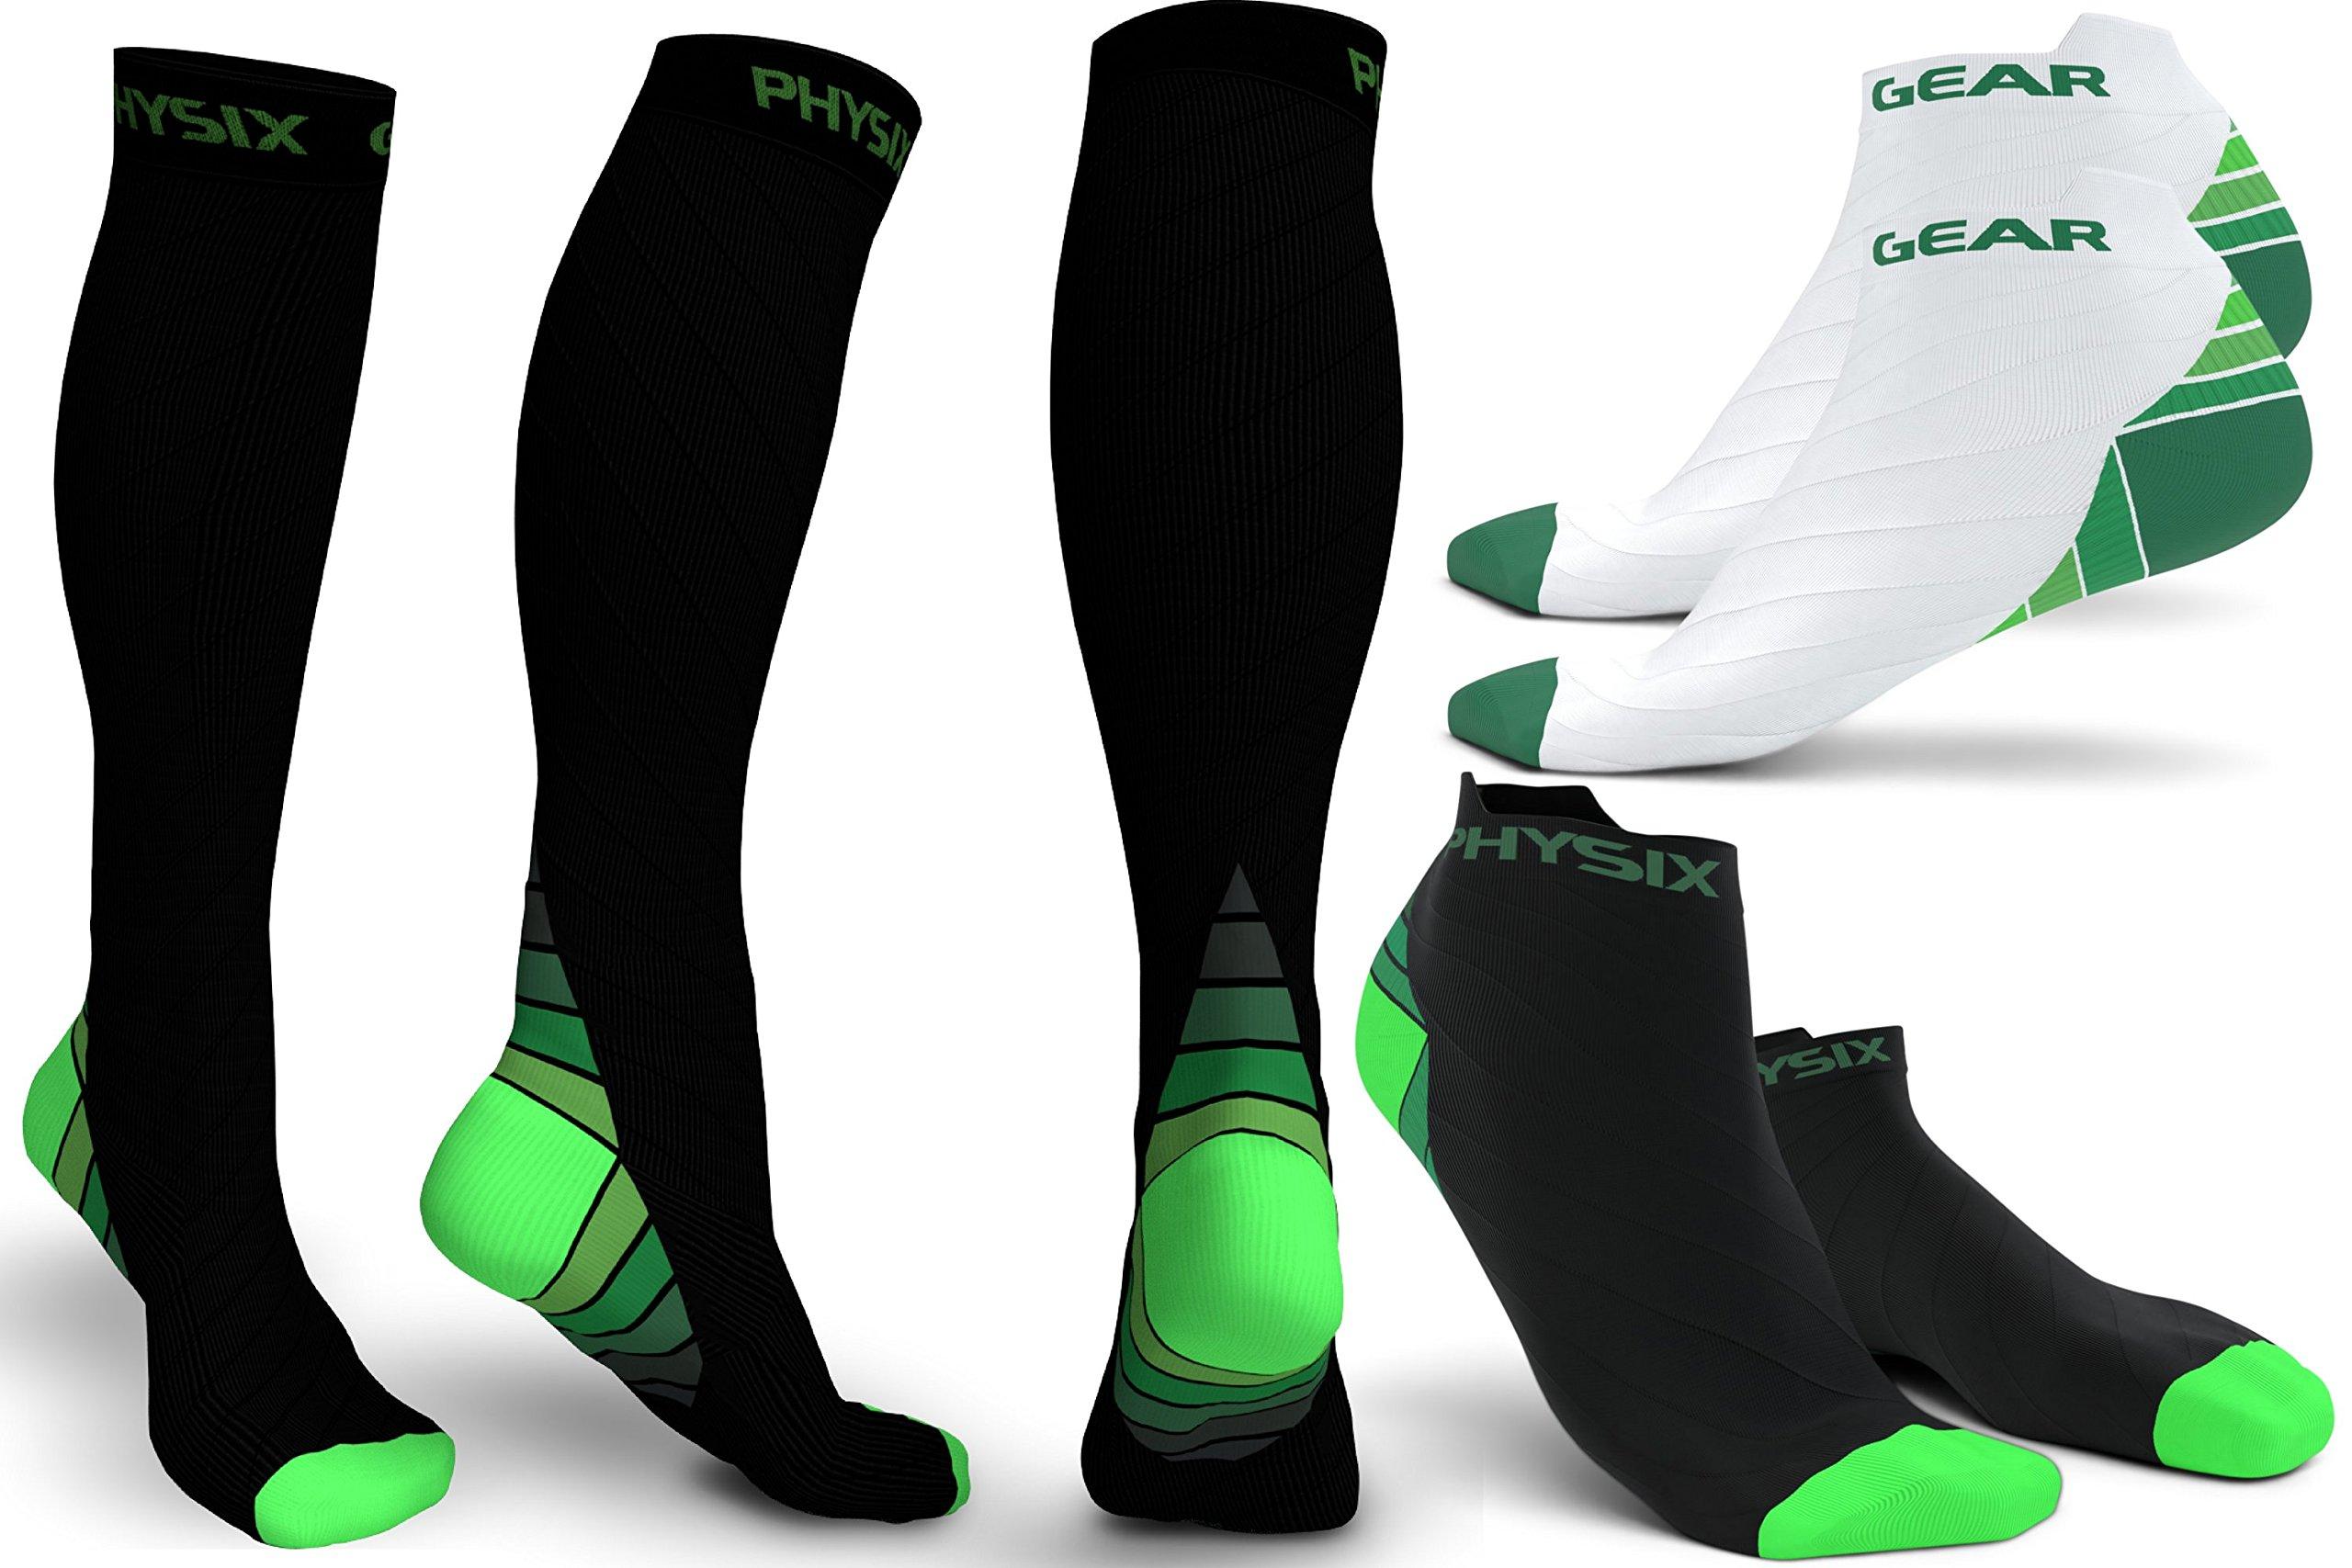 3 Pack Compression Socks for Men & Women 20-30 mmhg, Best Graduated Athletic Fit for Running Nurses Shin Splints Flight Travel & Maternity Pregnancy - Boost Stamina Circulation & Recovery GRN LXL